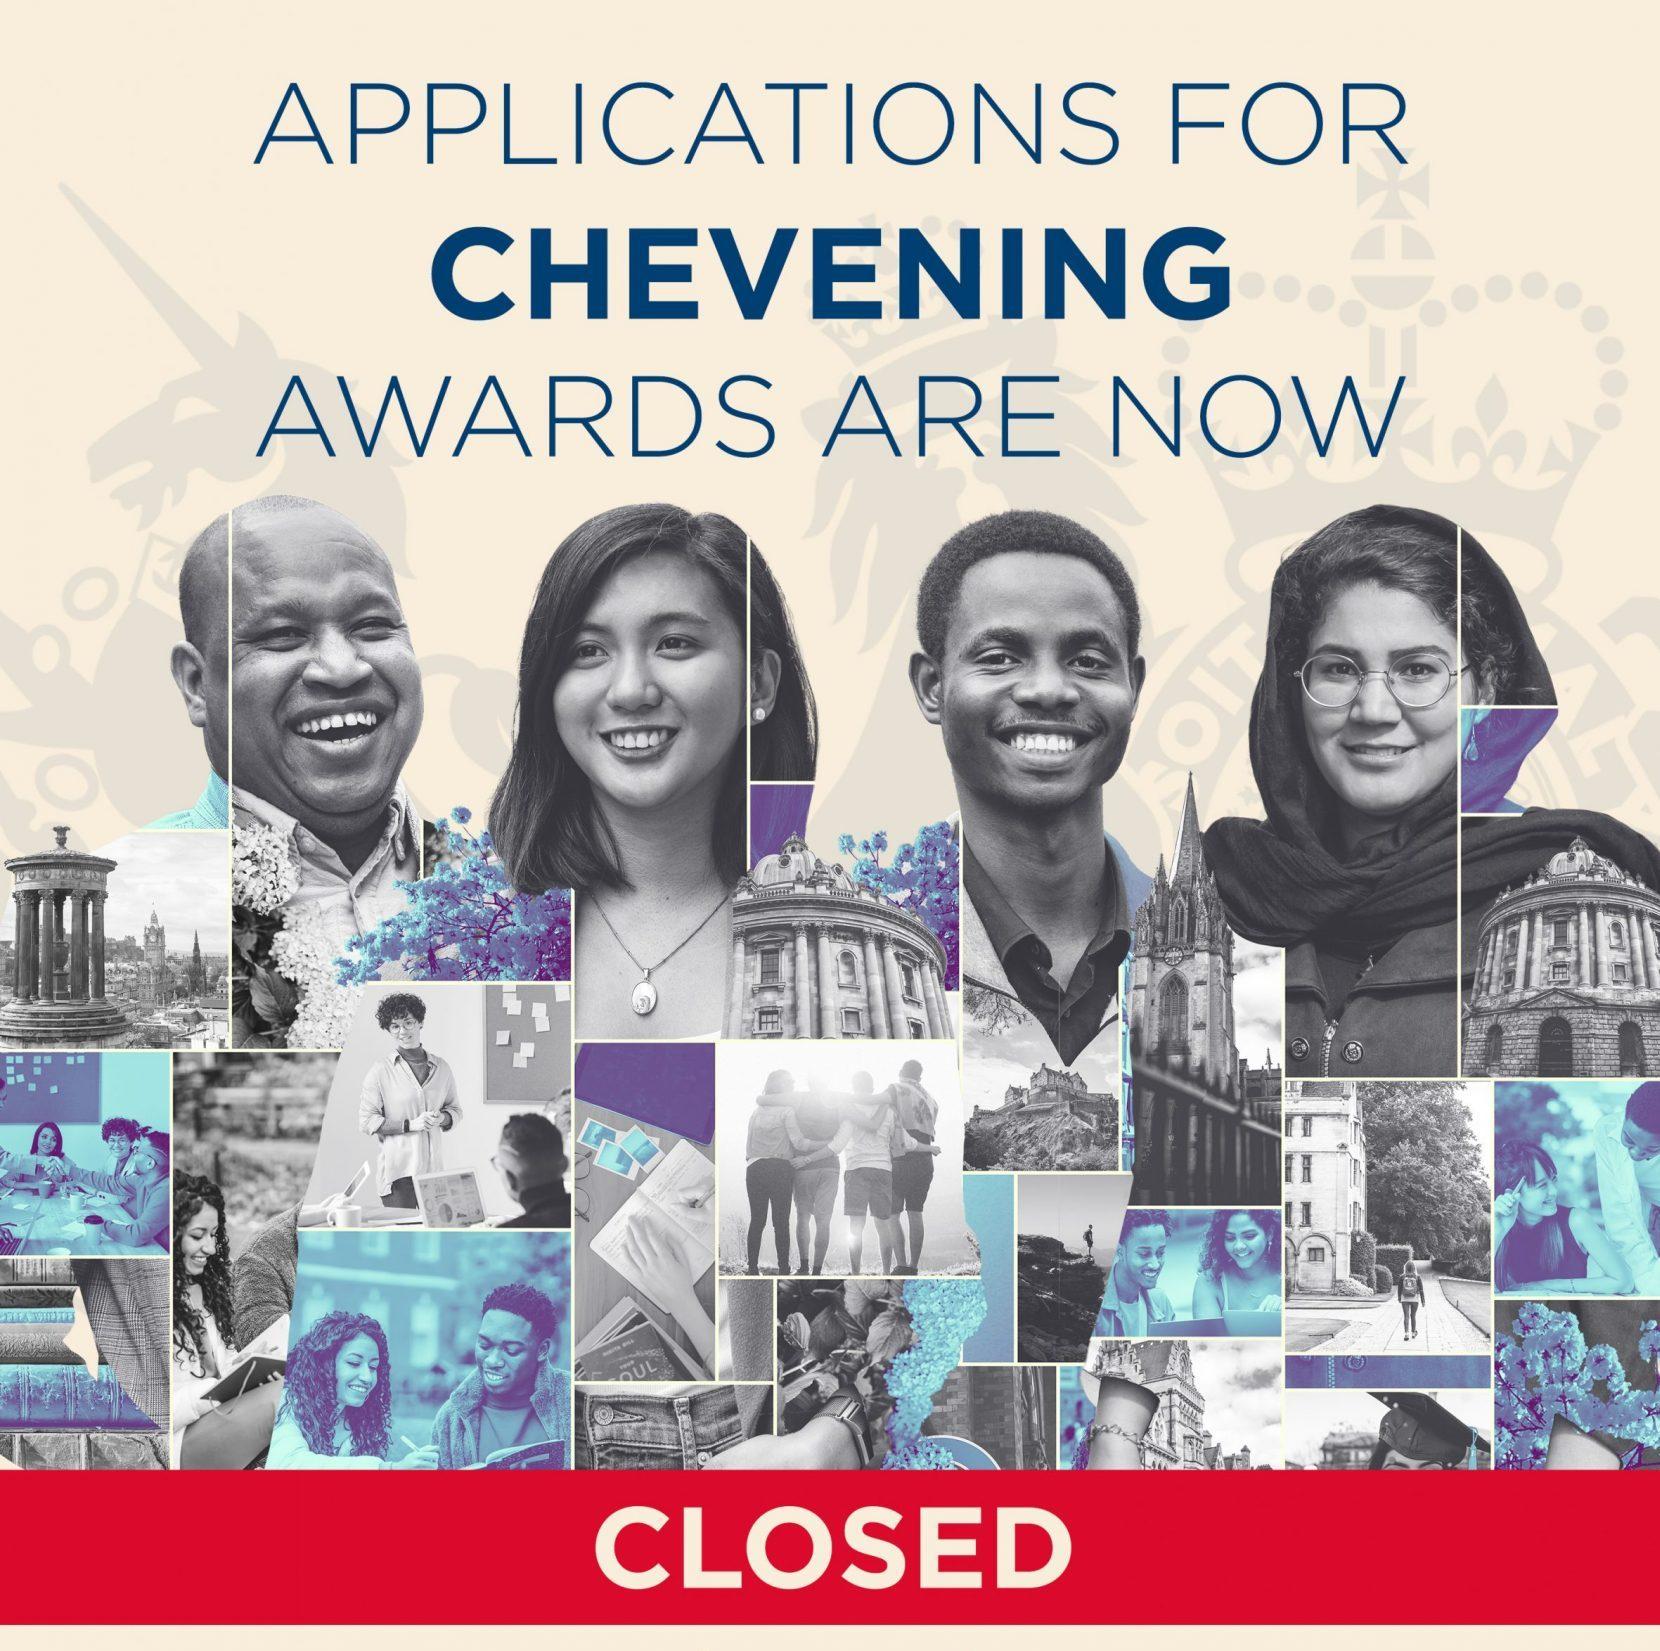 Applications close at 12:00 (midday) GMT.